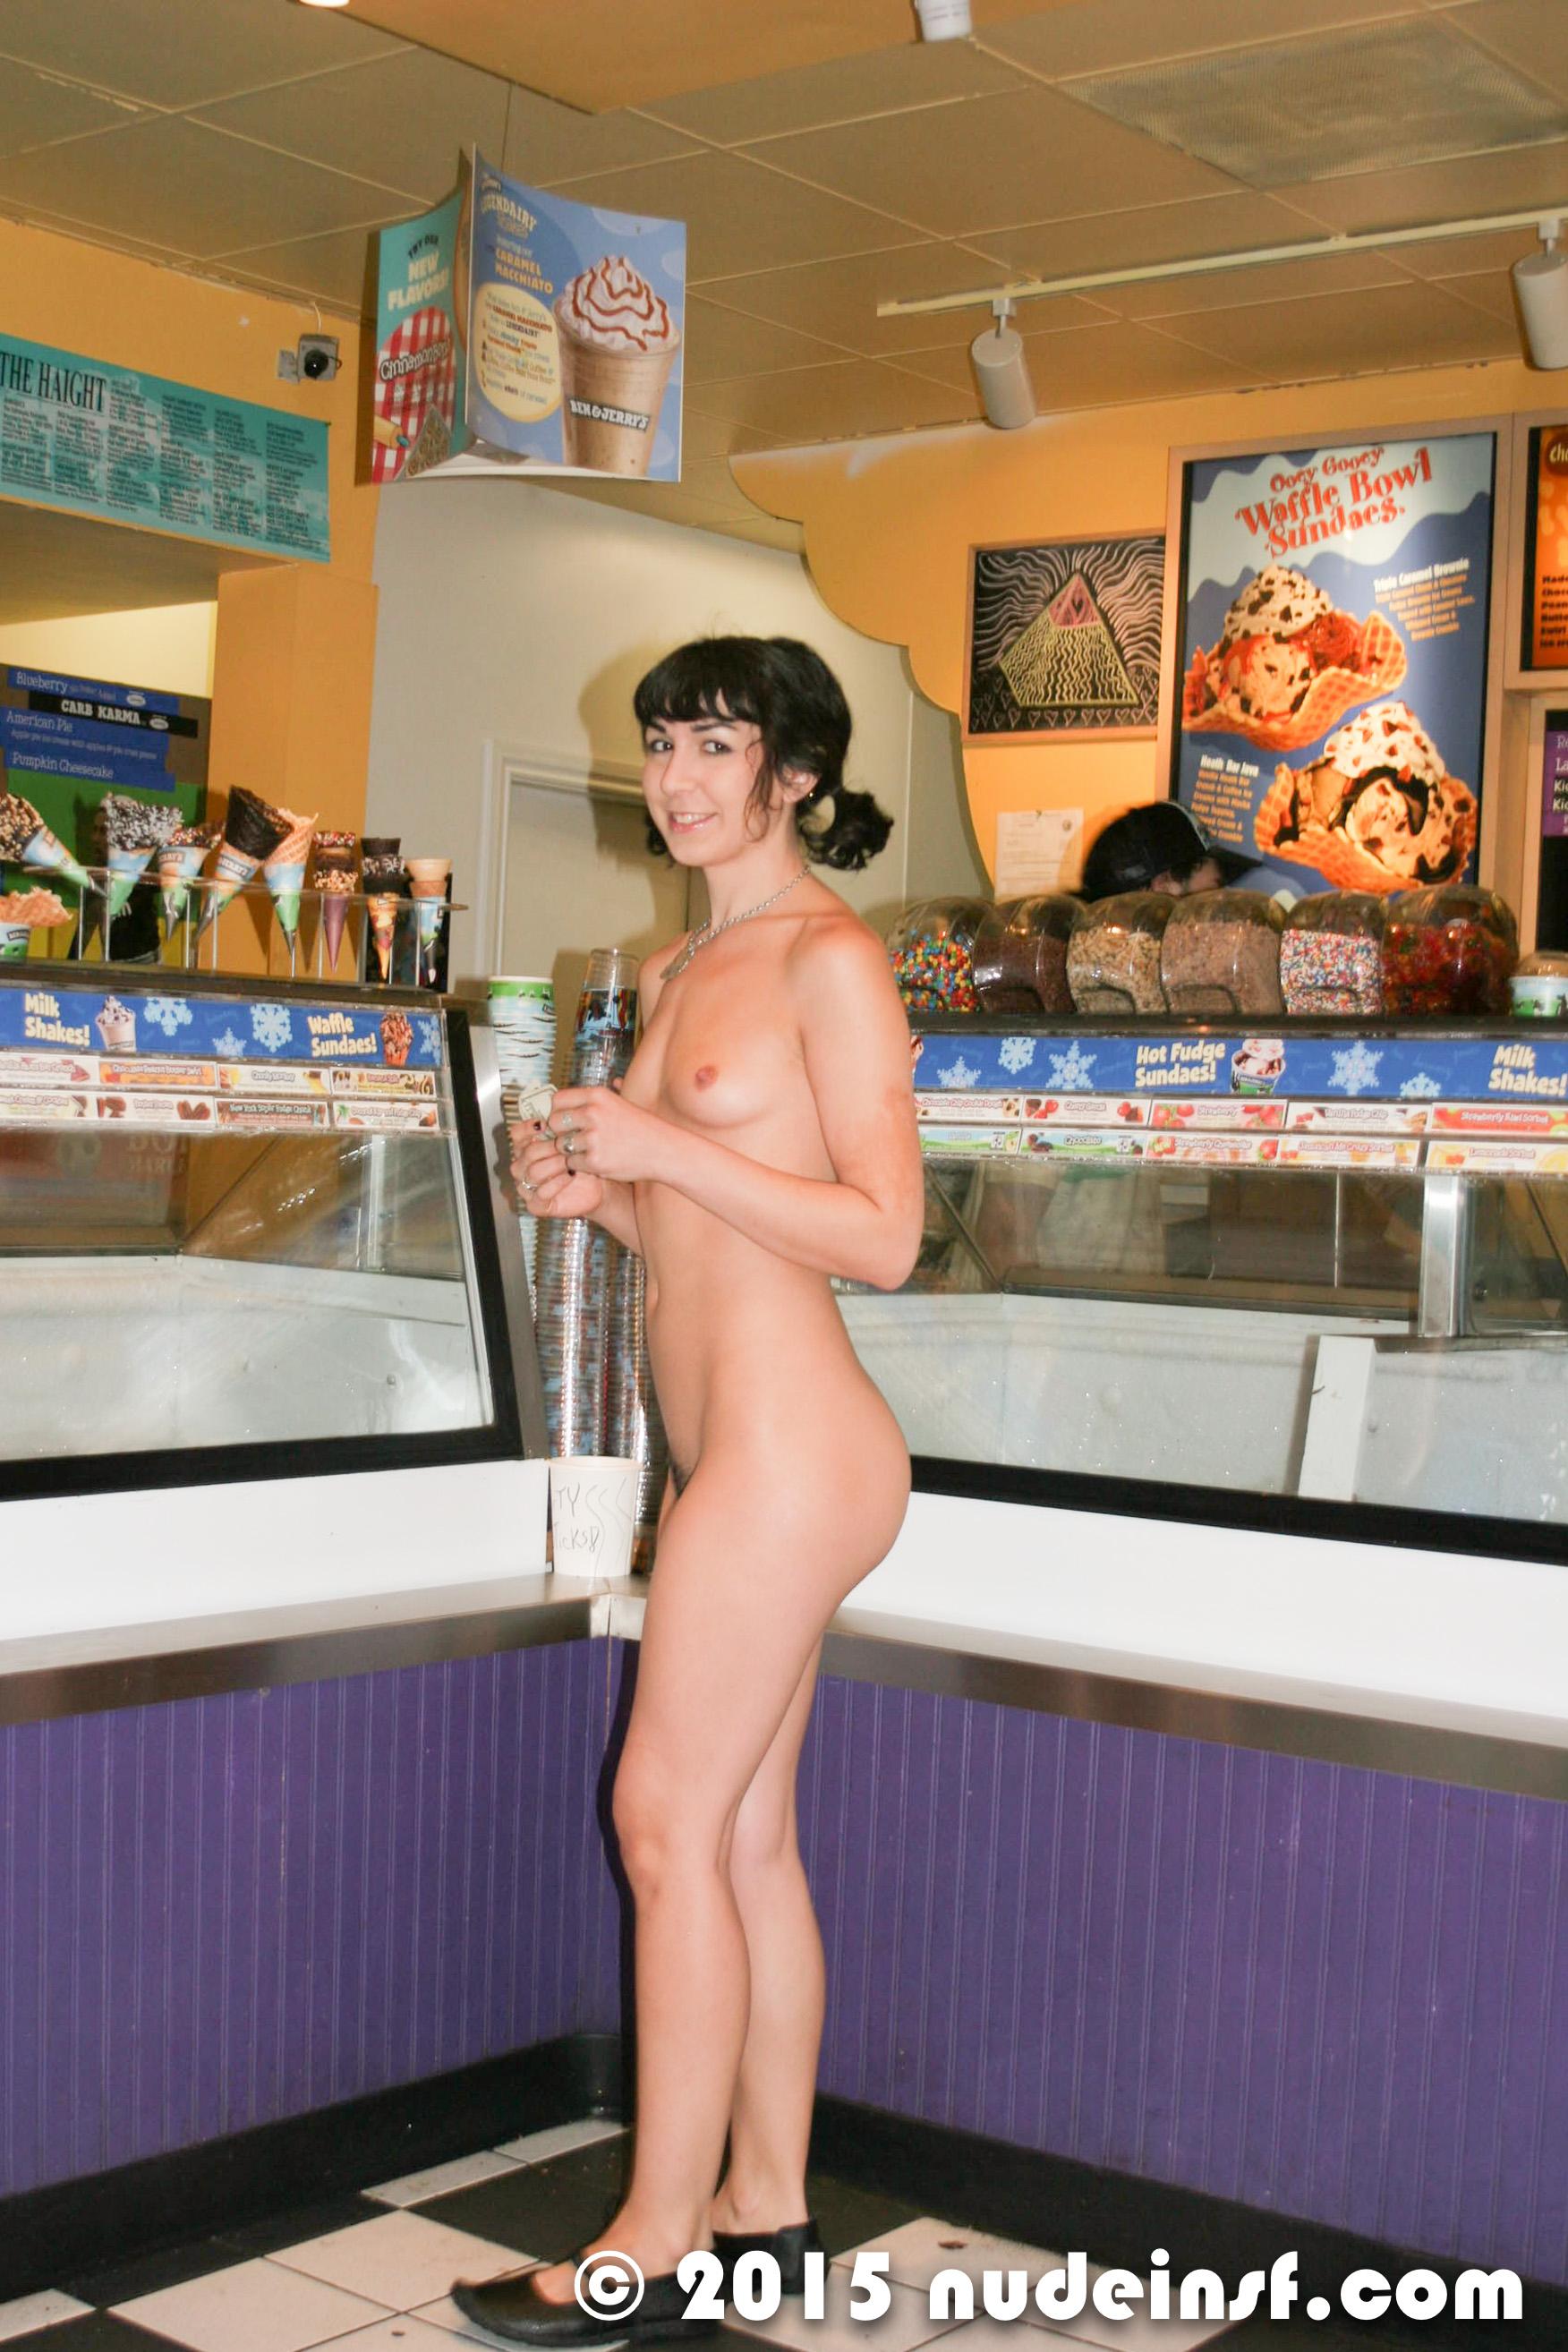 Marie - Public nudity in San Francisco California